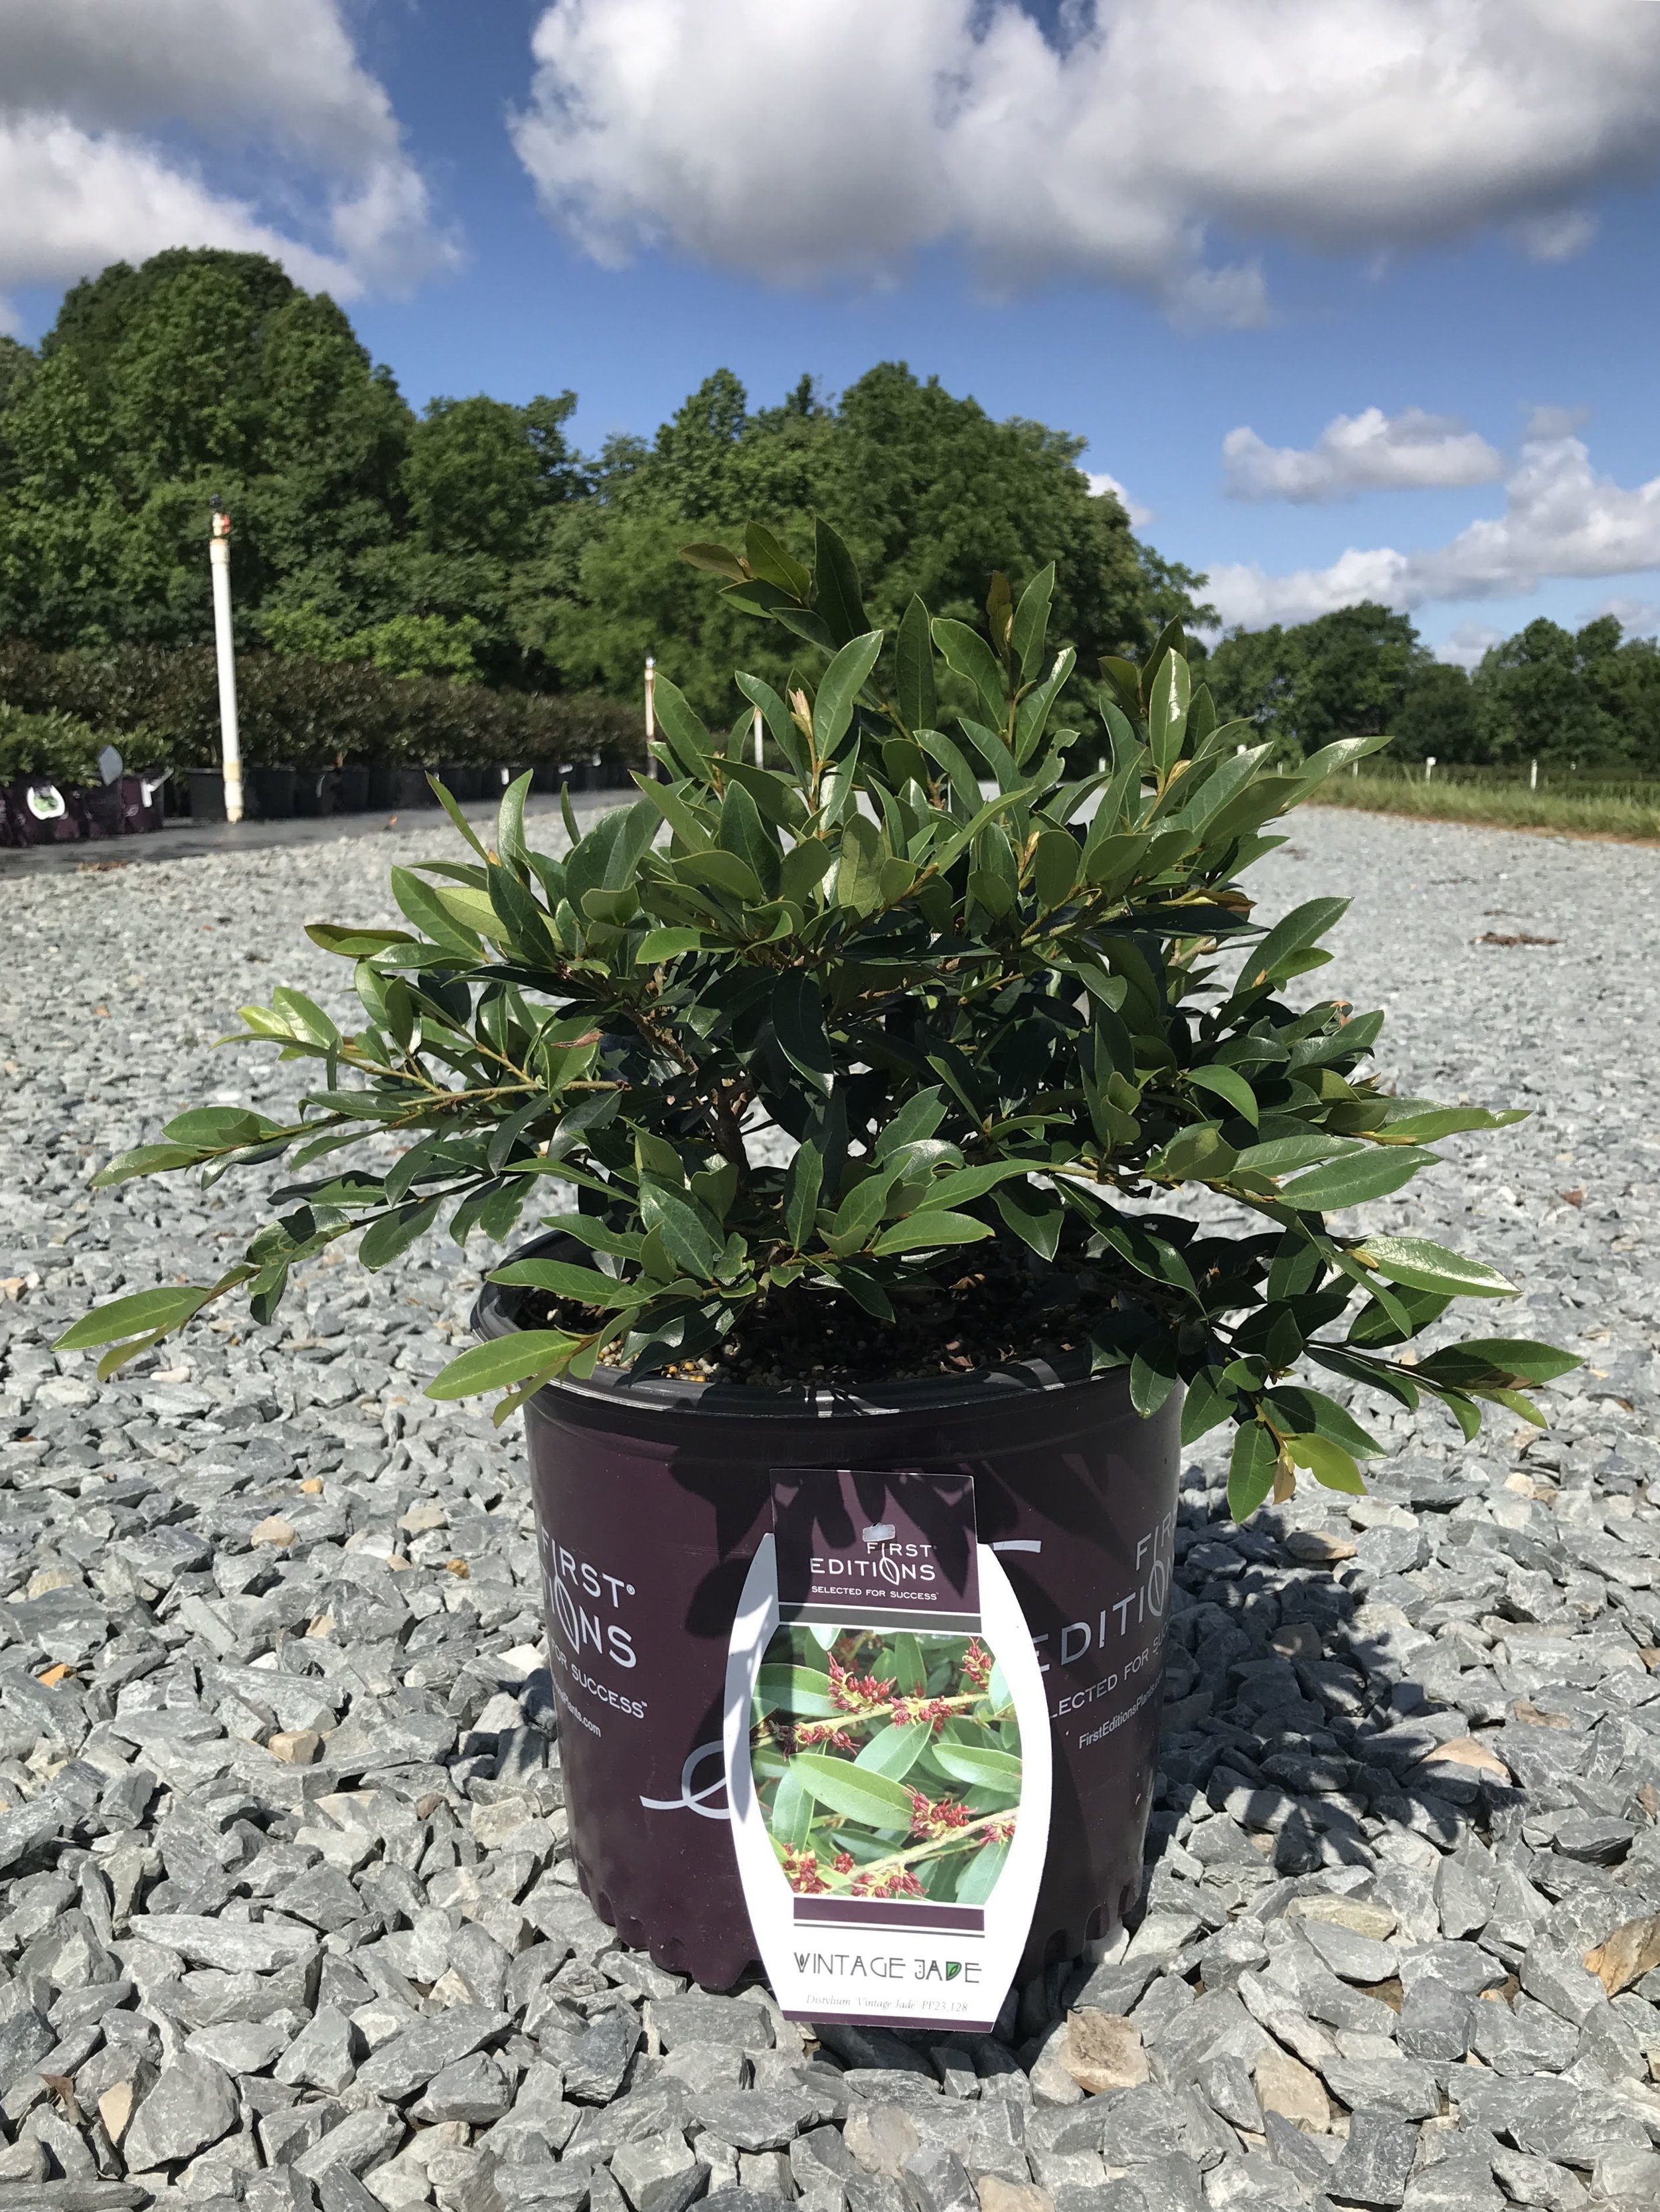 Distylium myricoides 'Vintage Jade' 3 gallon